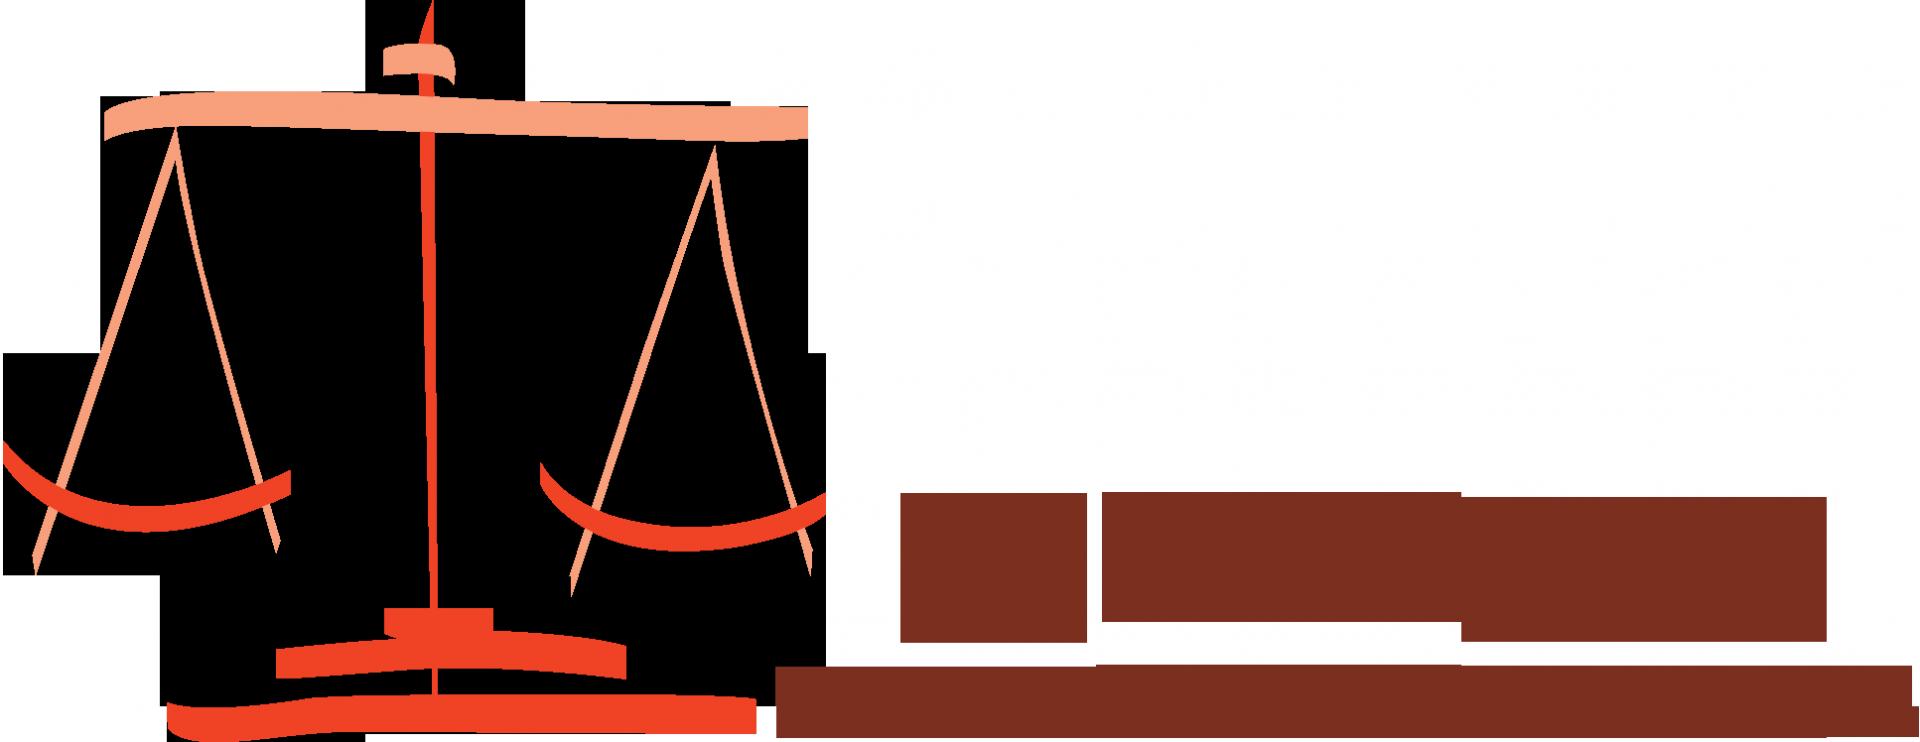 proc dure de divorce martinique avocat viviane desroses de kermadec proc dure consentement. Black Bedroom Furniture Sets. Home Design Ideas